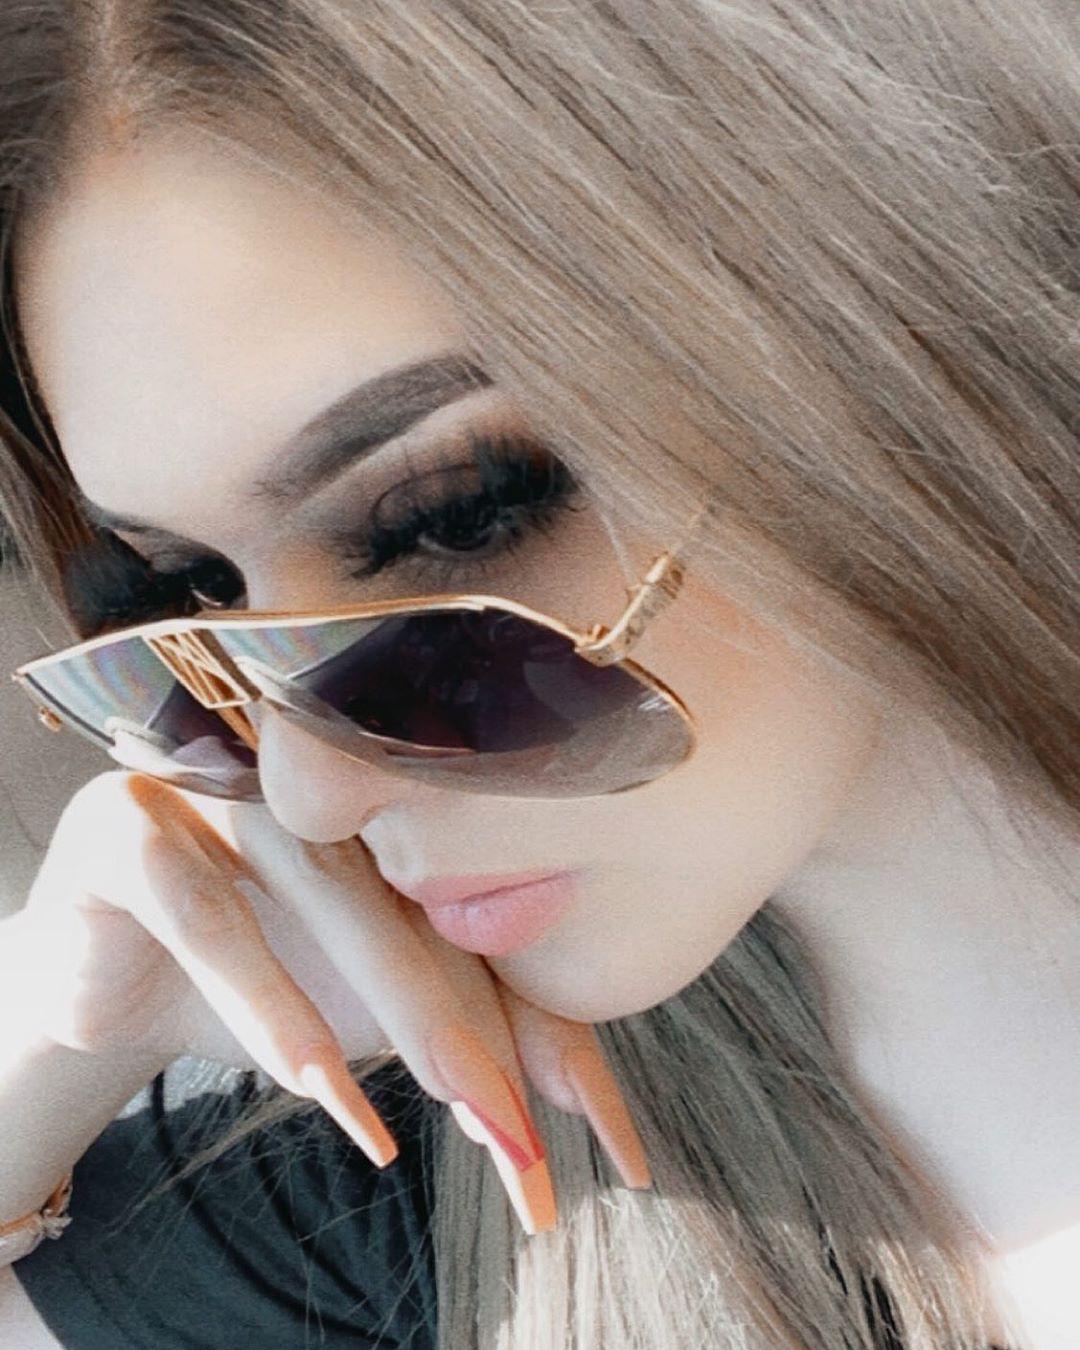 Graciela Montes Model, KKW Beauty, Plastic surgery